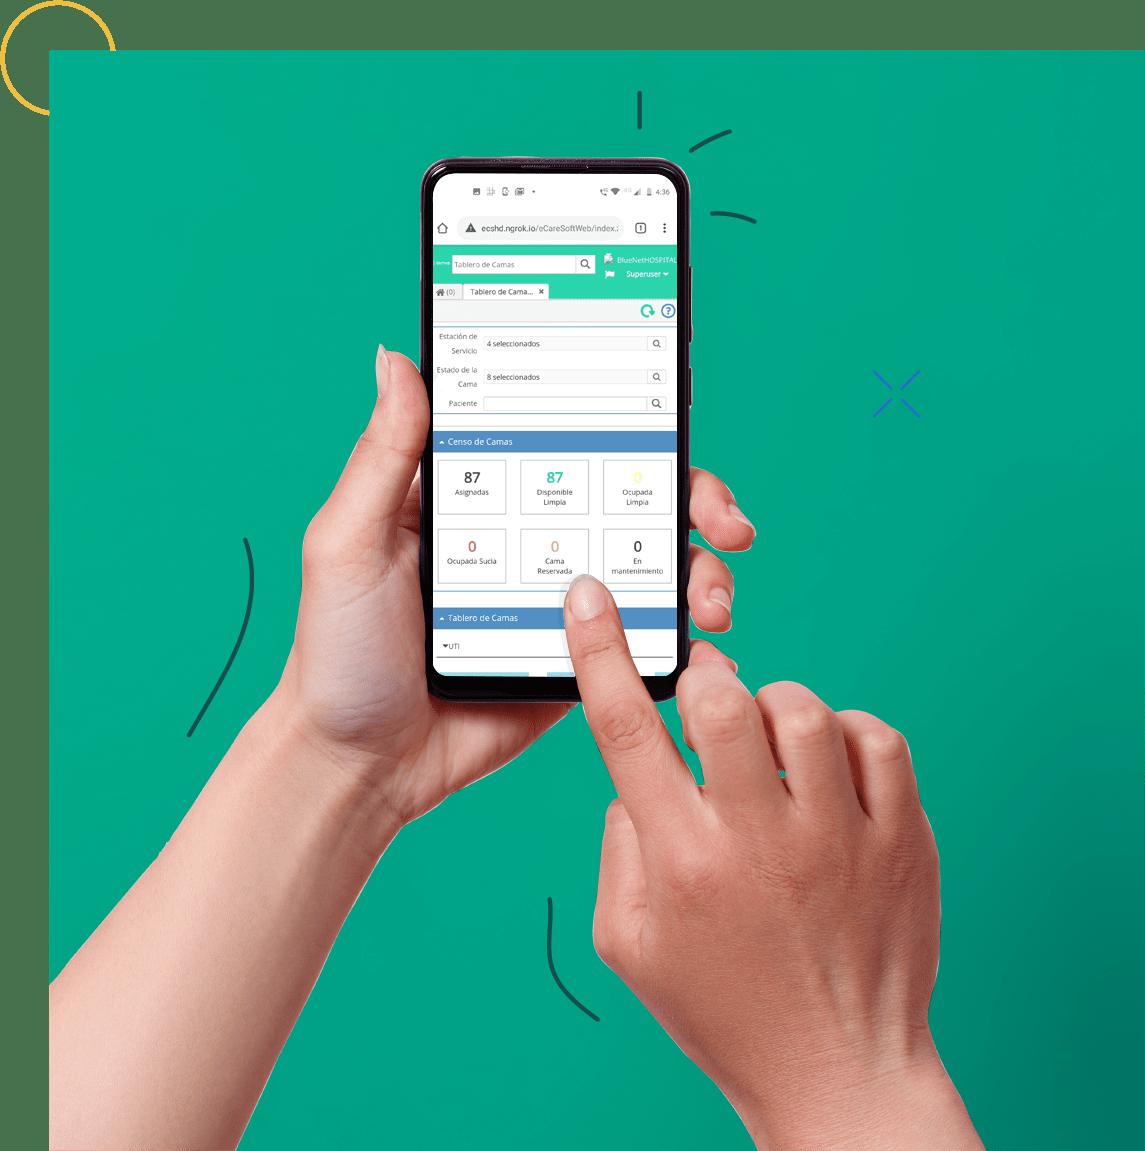 hands holding phone using cirrus app